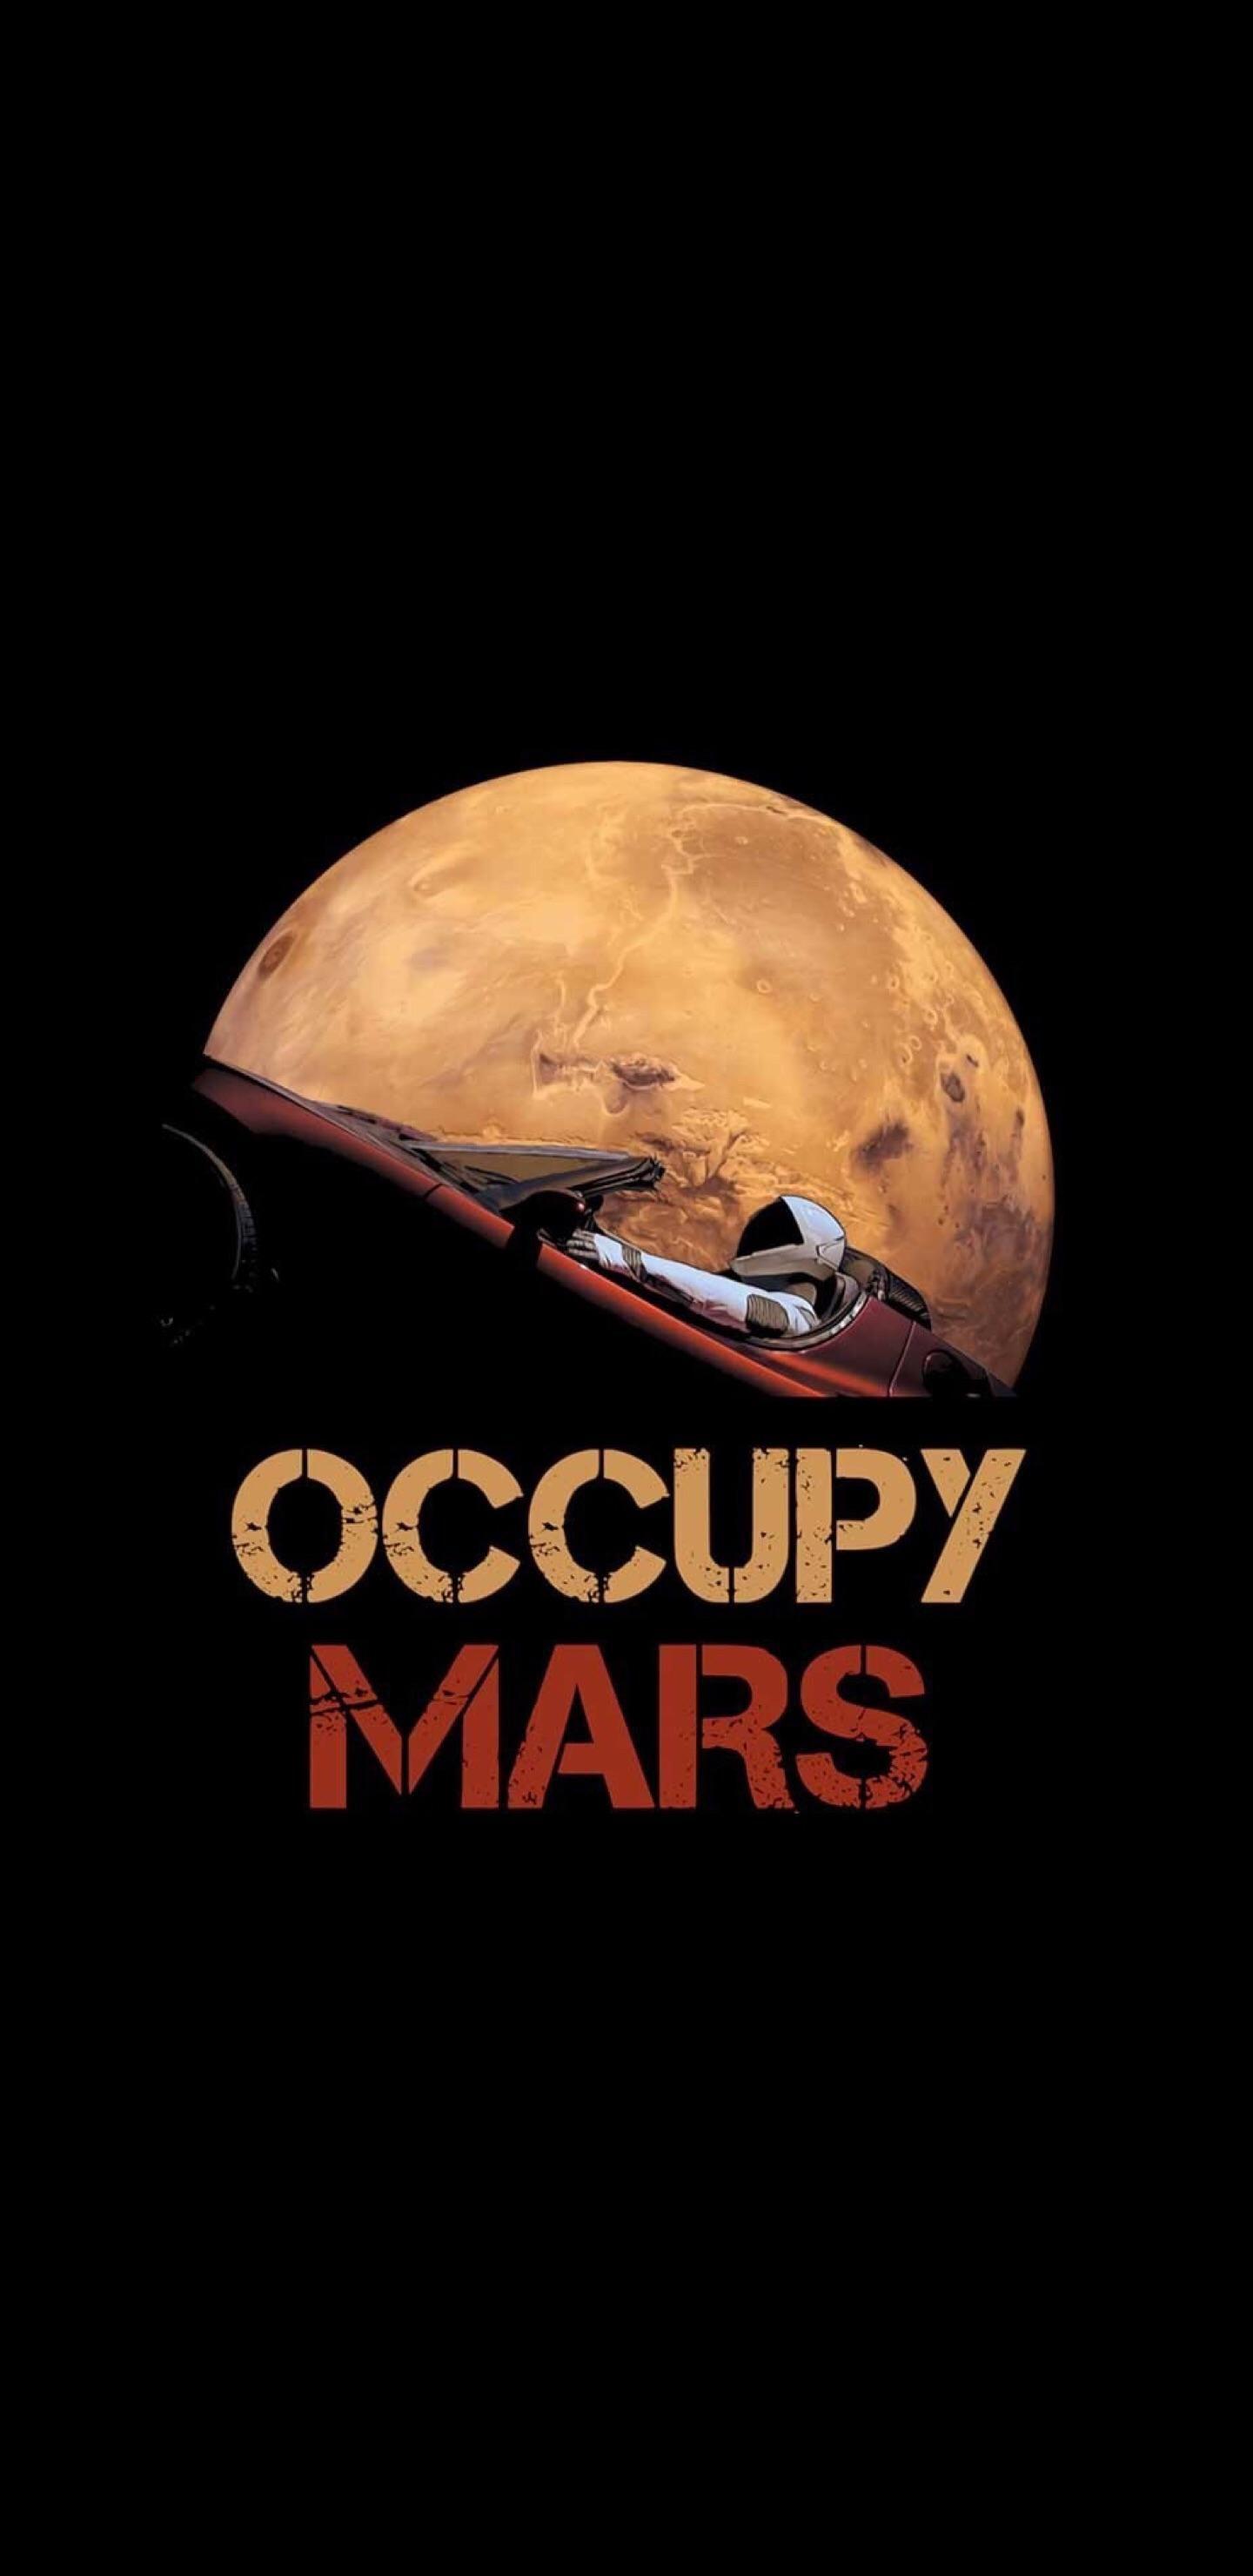 Occupy Mars Mars Wallpaper Phone Wallpaper Samurai Artwork